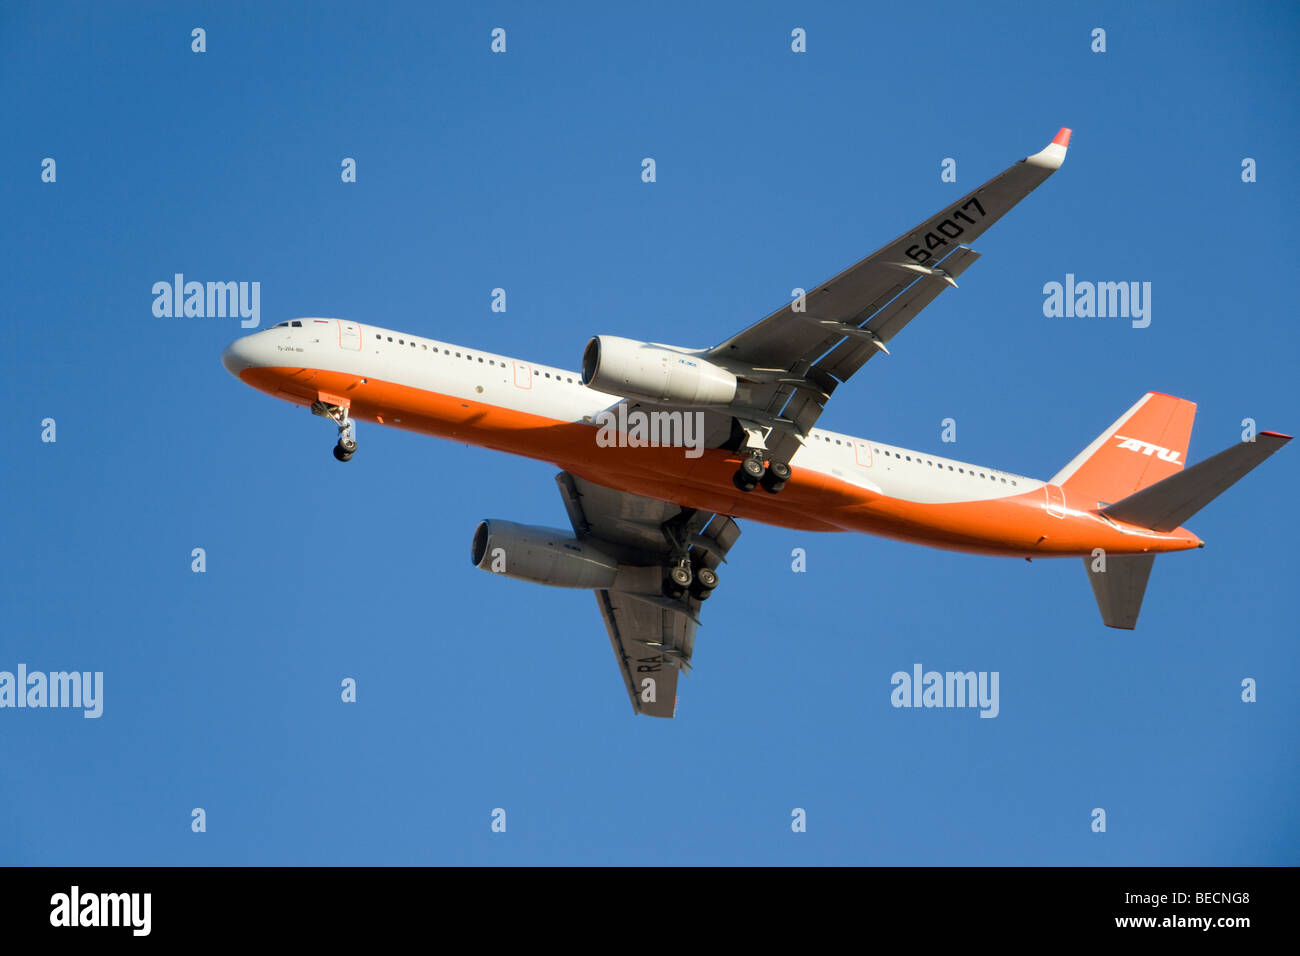 ATU Tupolev Tu-204-100 RA 64017 - Stock Image